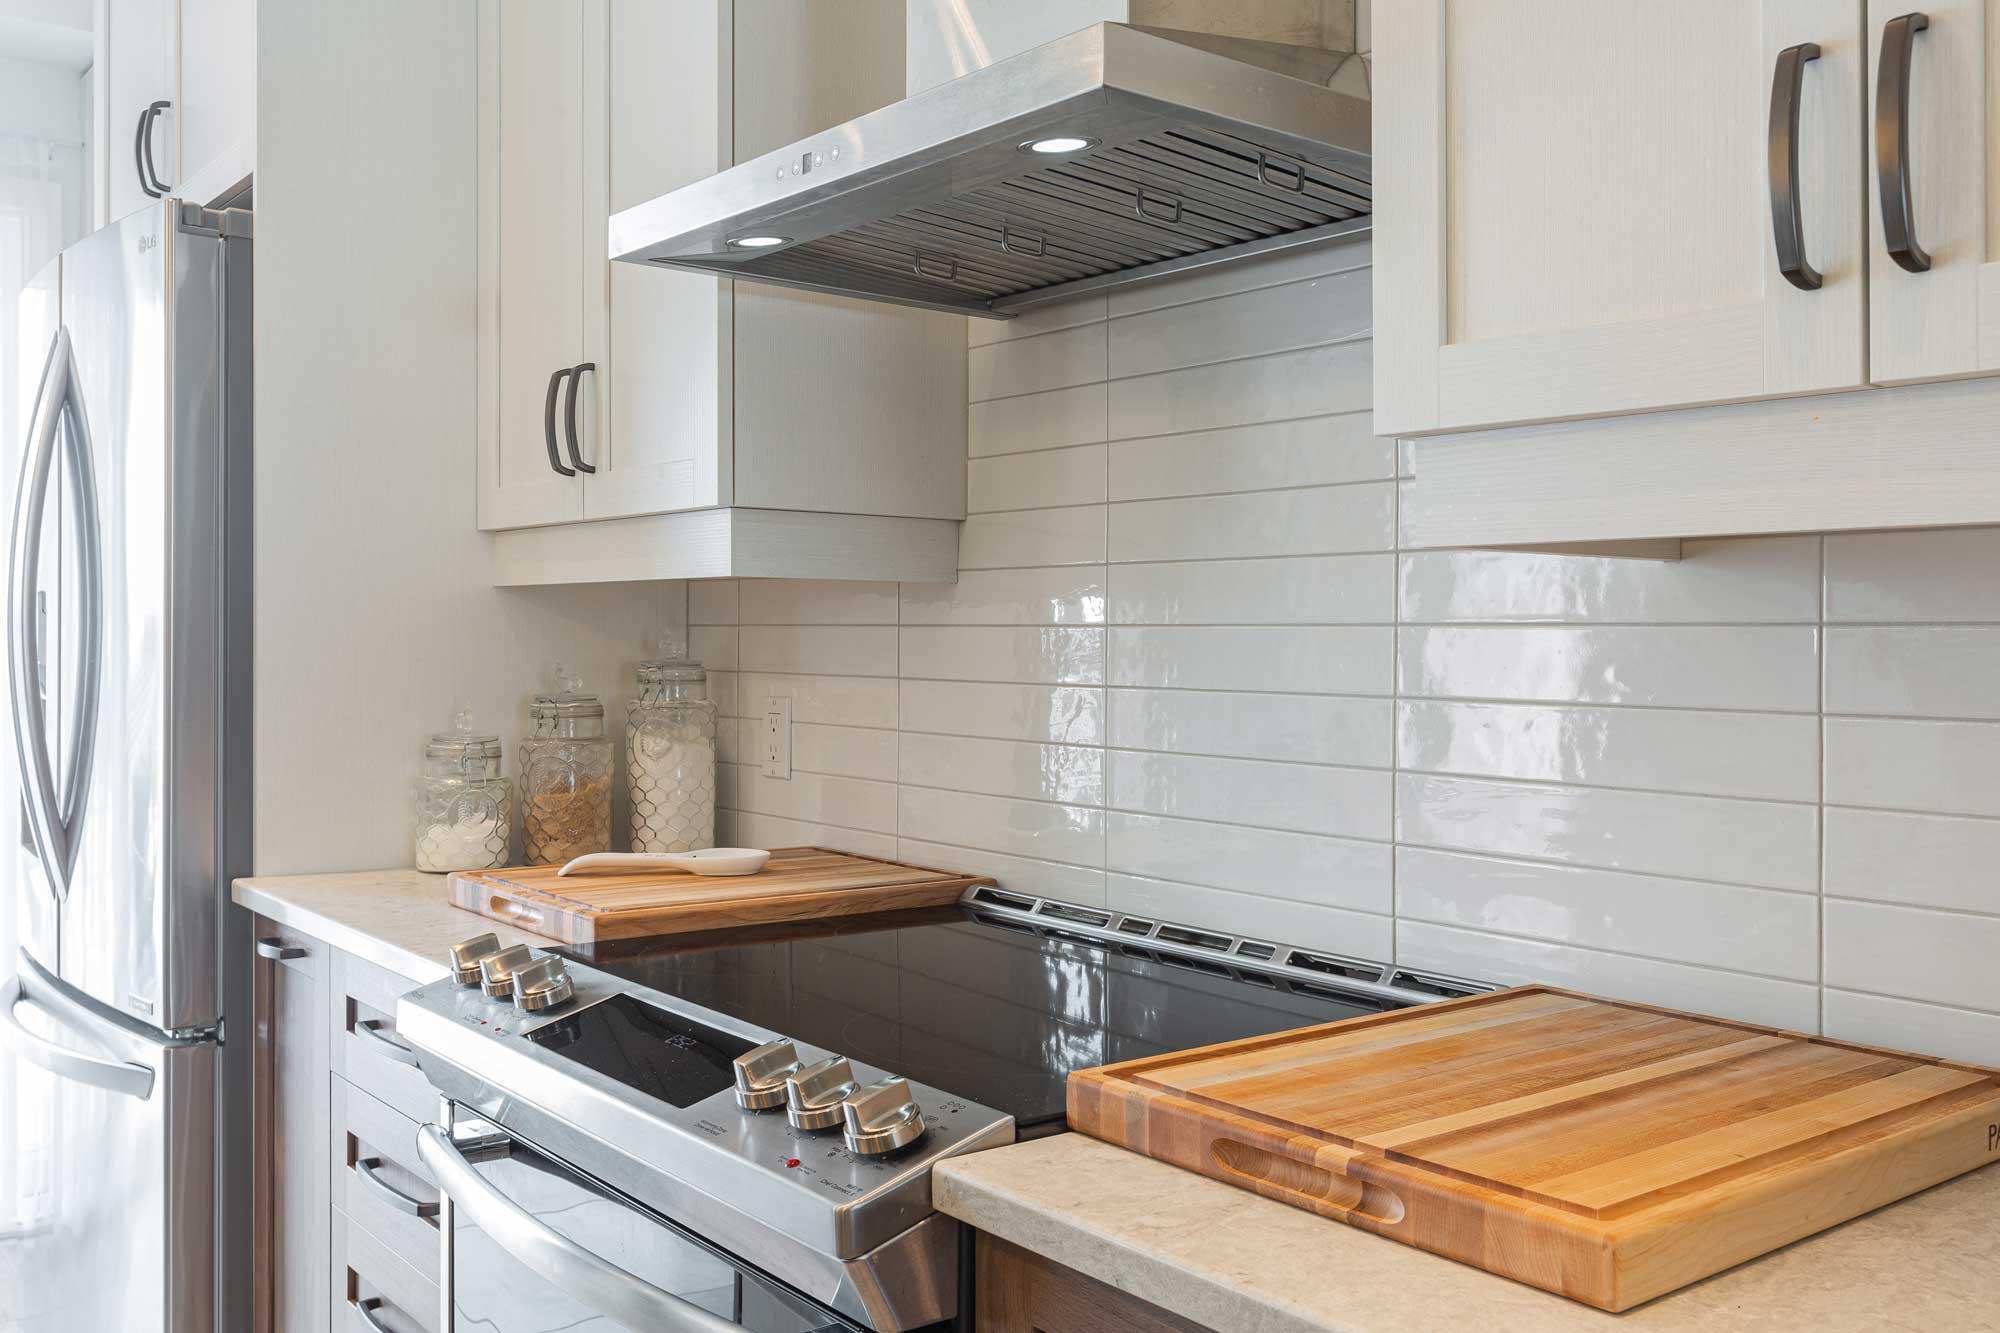 white metro tiles backsplash in modern kitchen